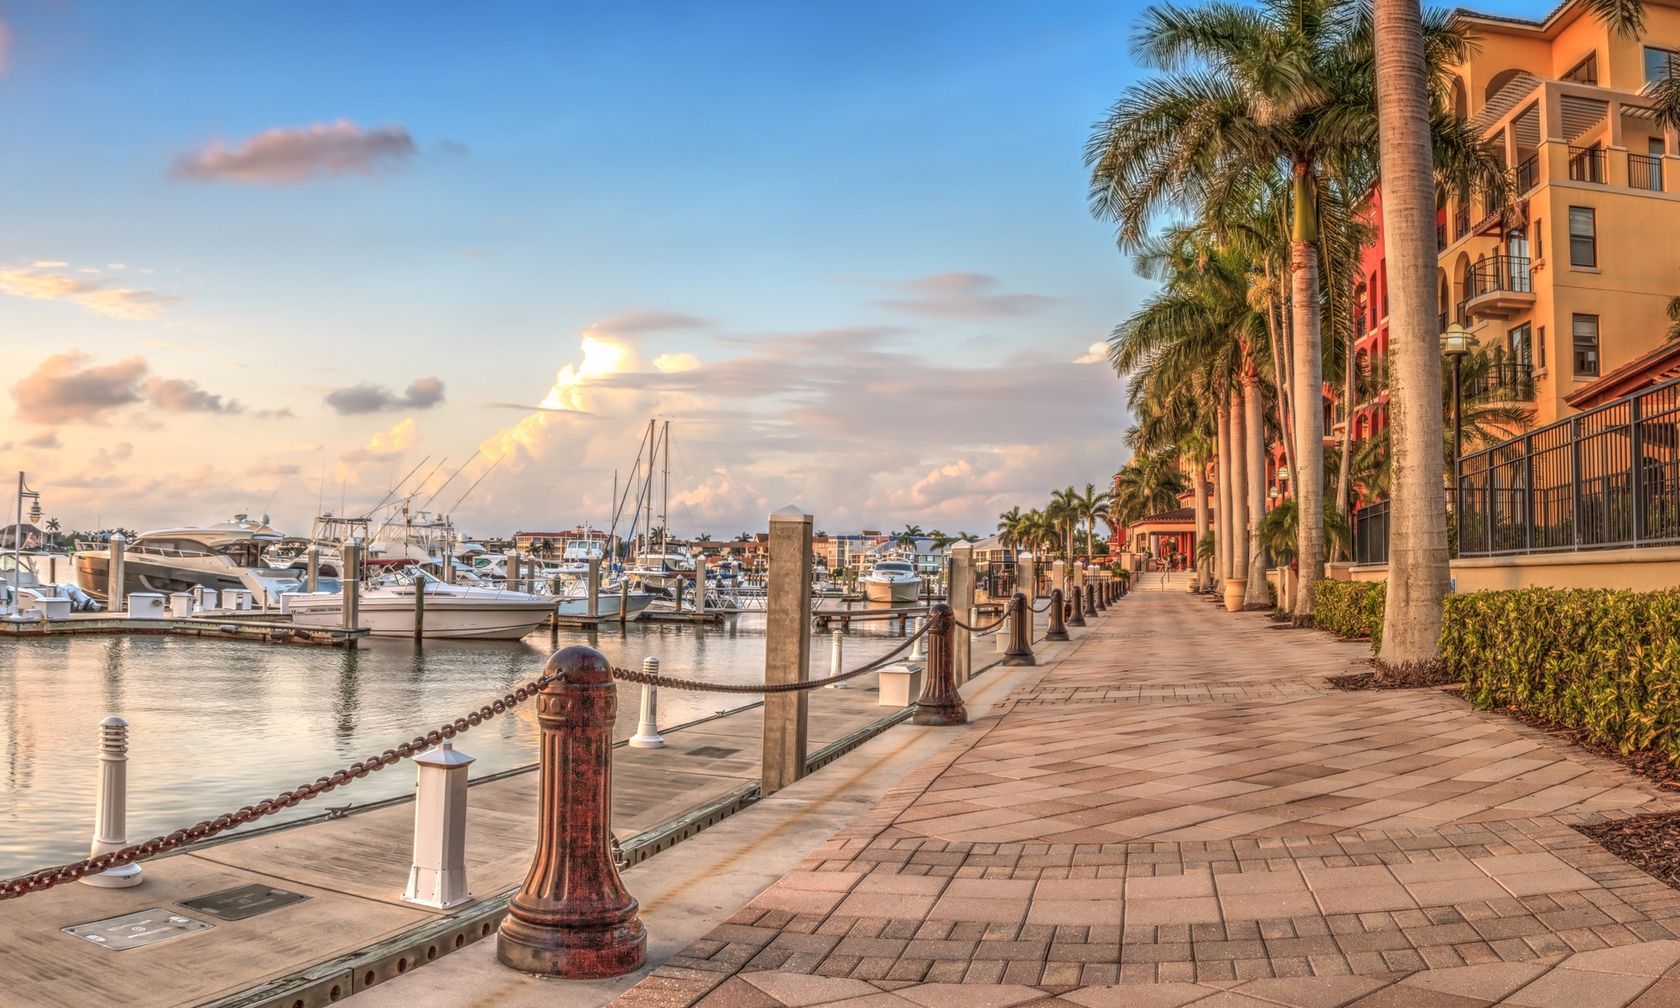 Vacation rentals in Marco Island